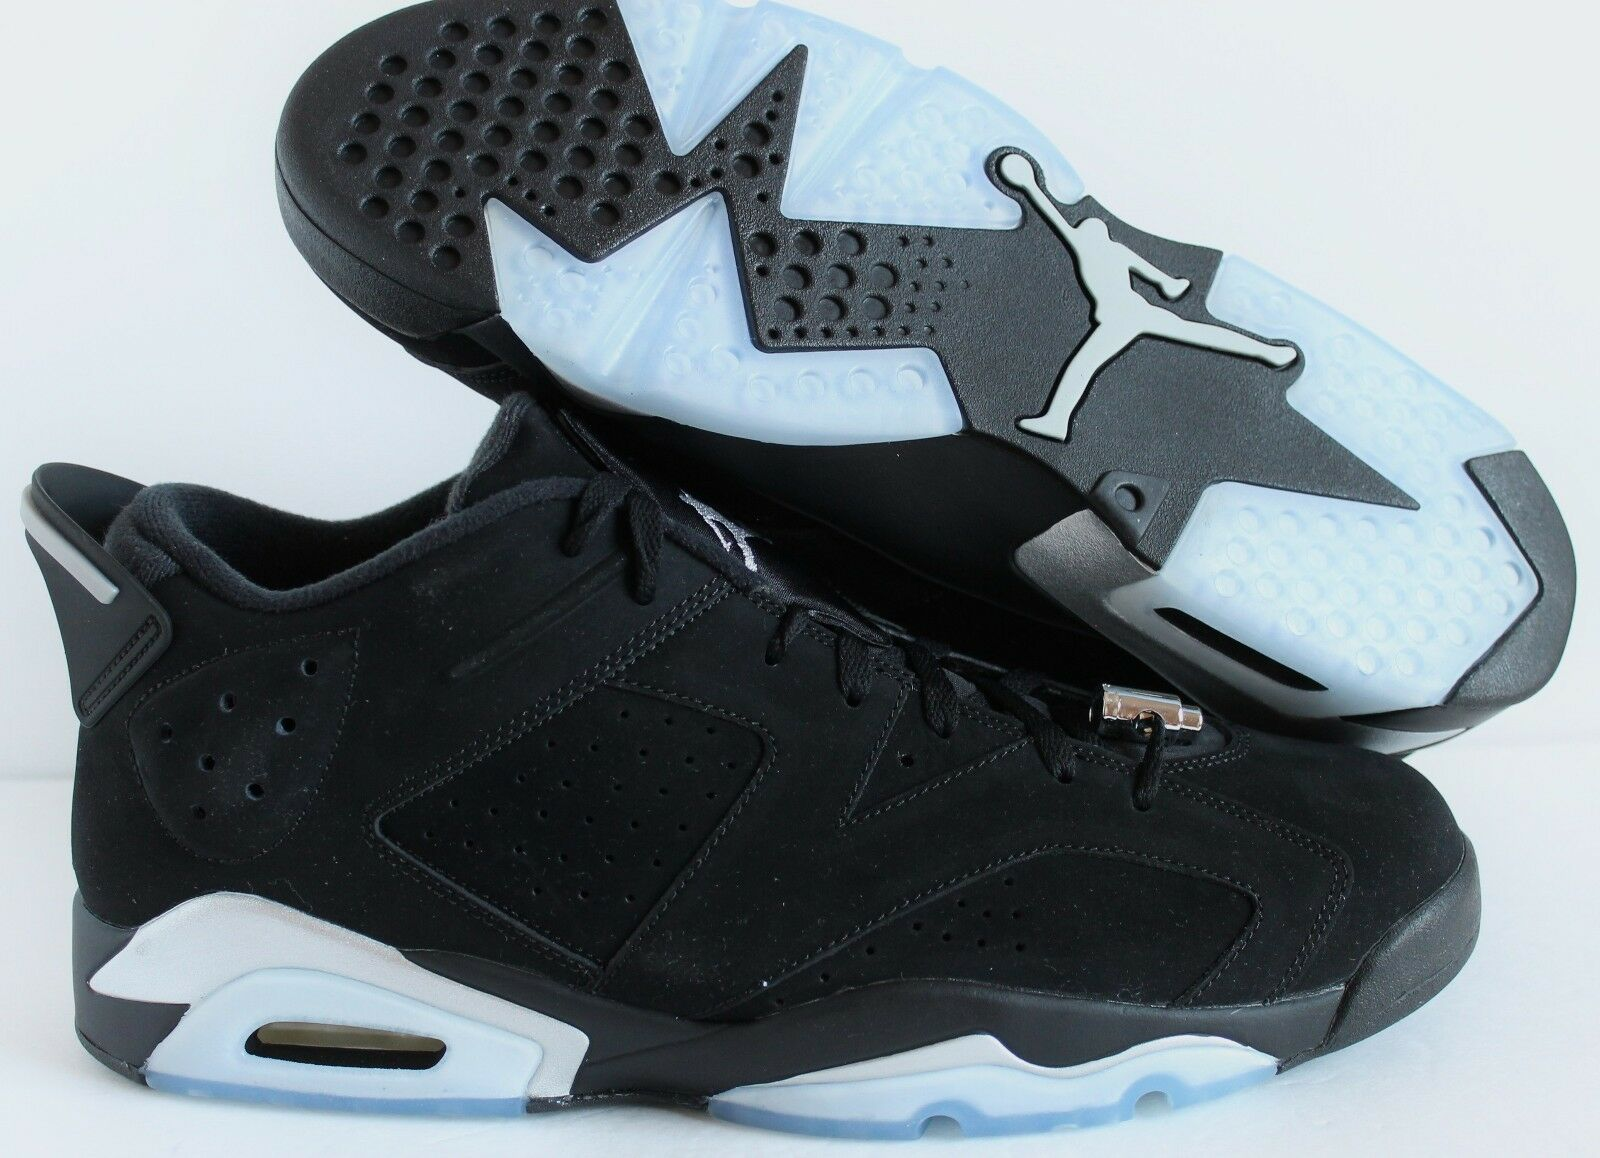 Nike Air Jordan 6 Retro [304401-003] Bajo Negro-Plateado Metálico-Blanco [304401-003] Retro 7fdcbe